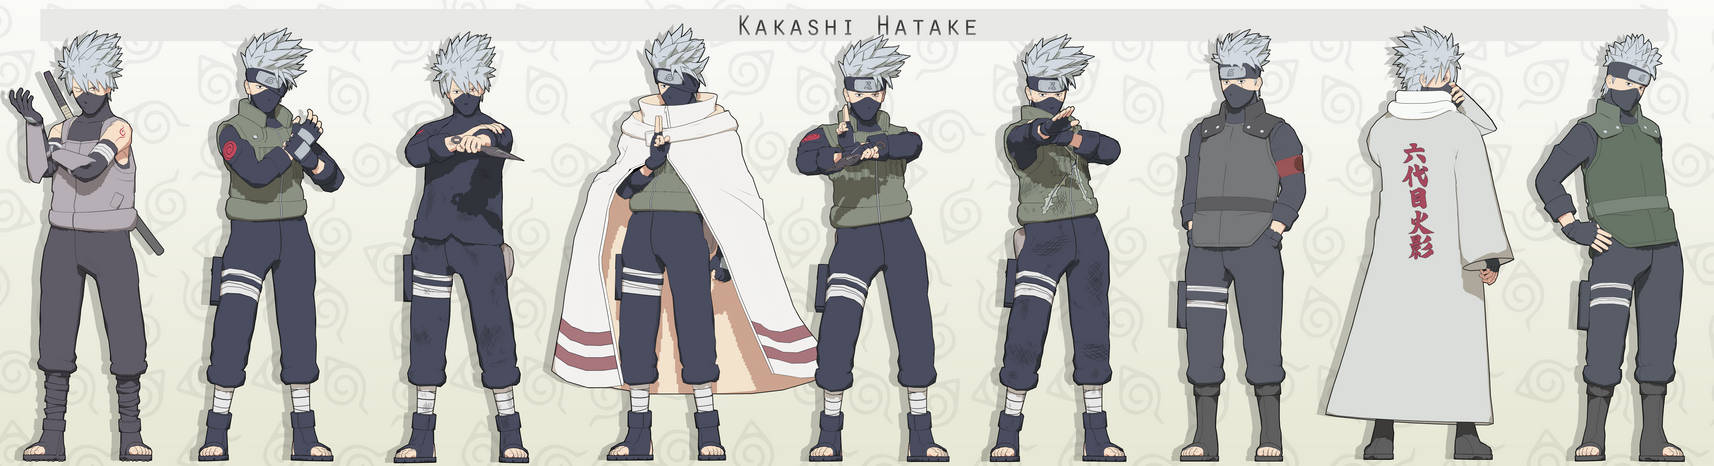 MMD Kakashi Hatake Pack + DL